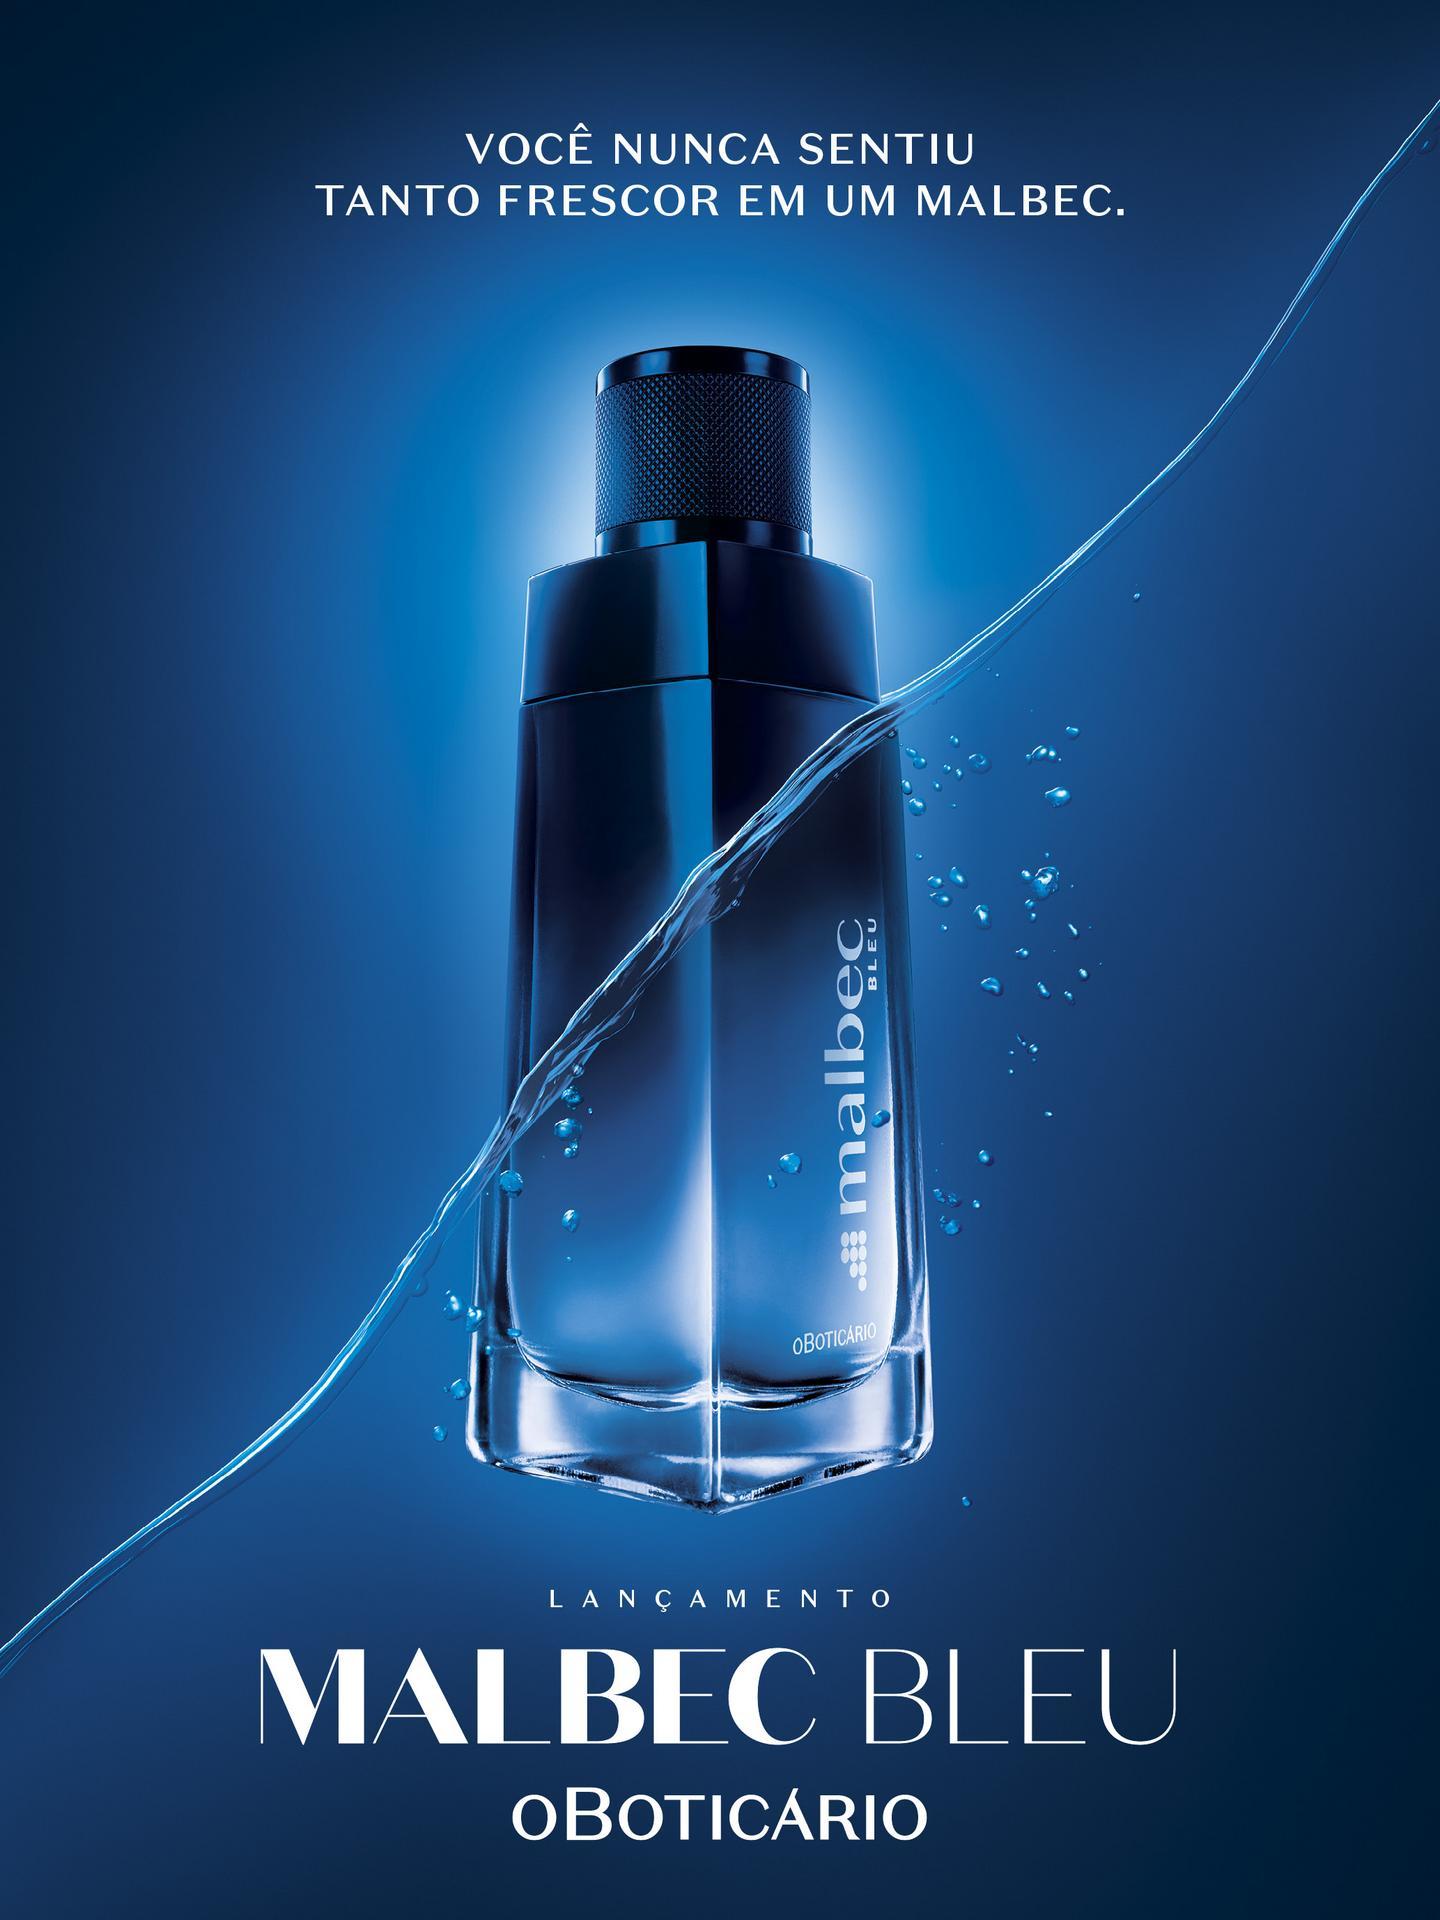 Malbec Bleu